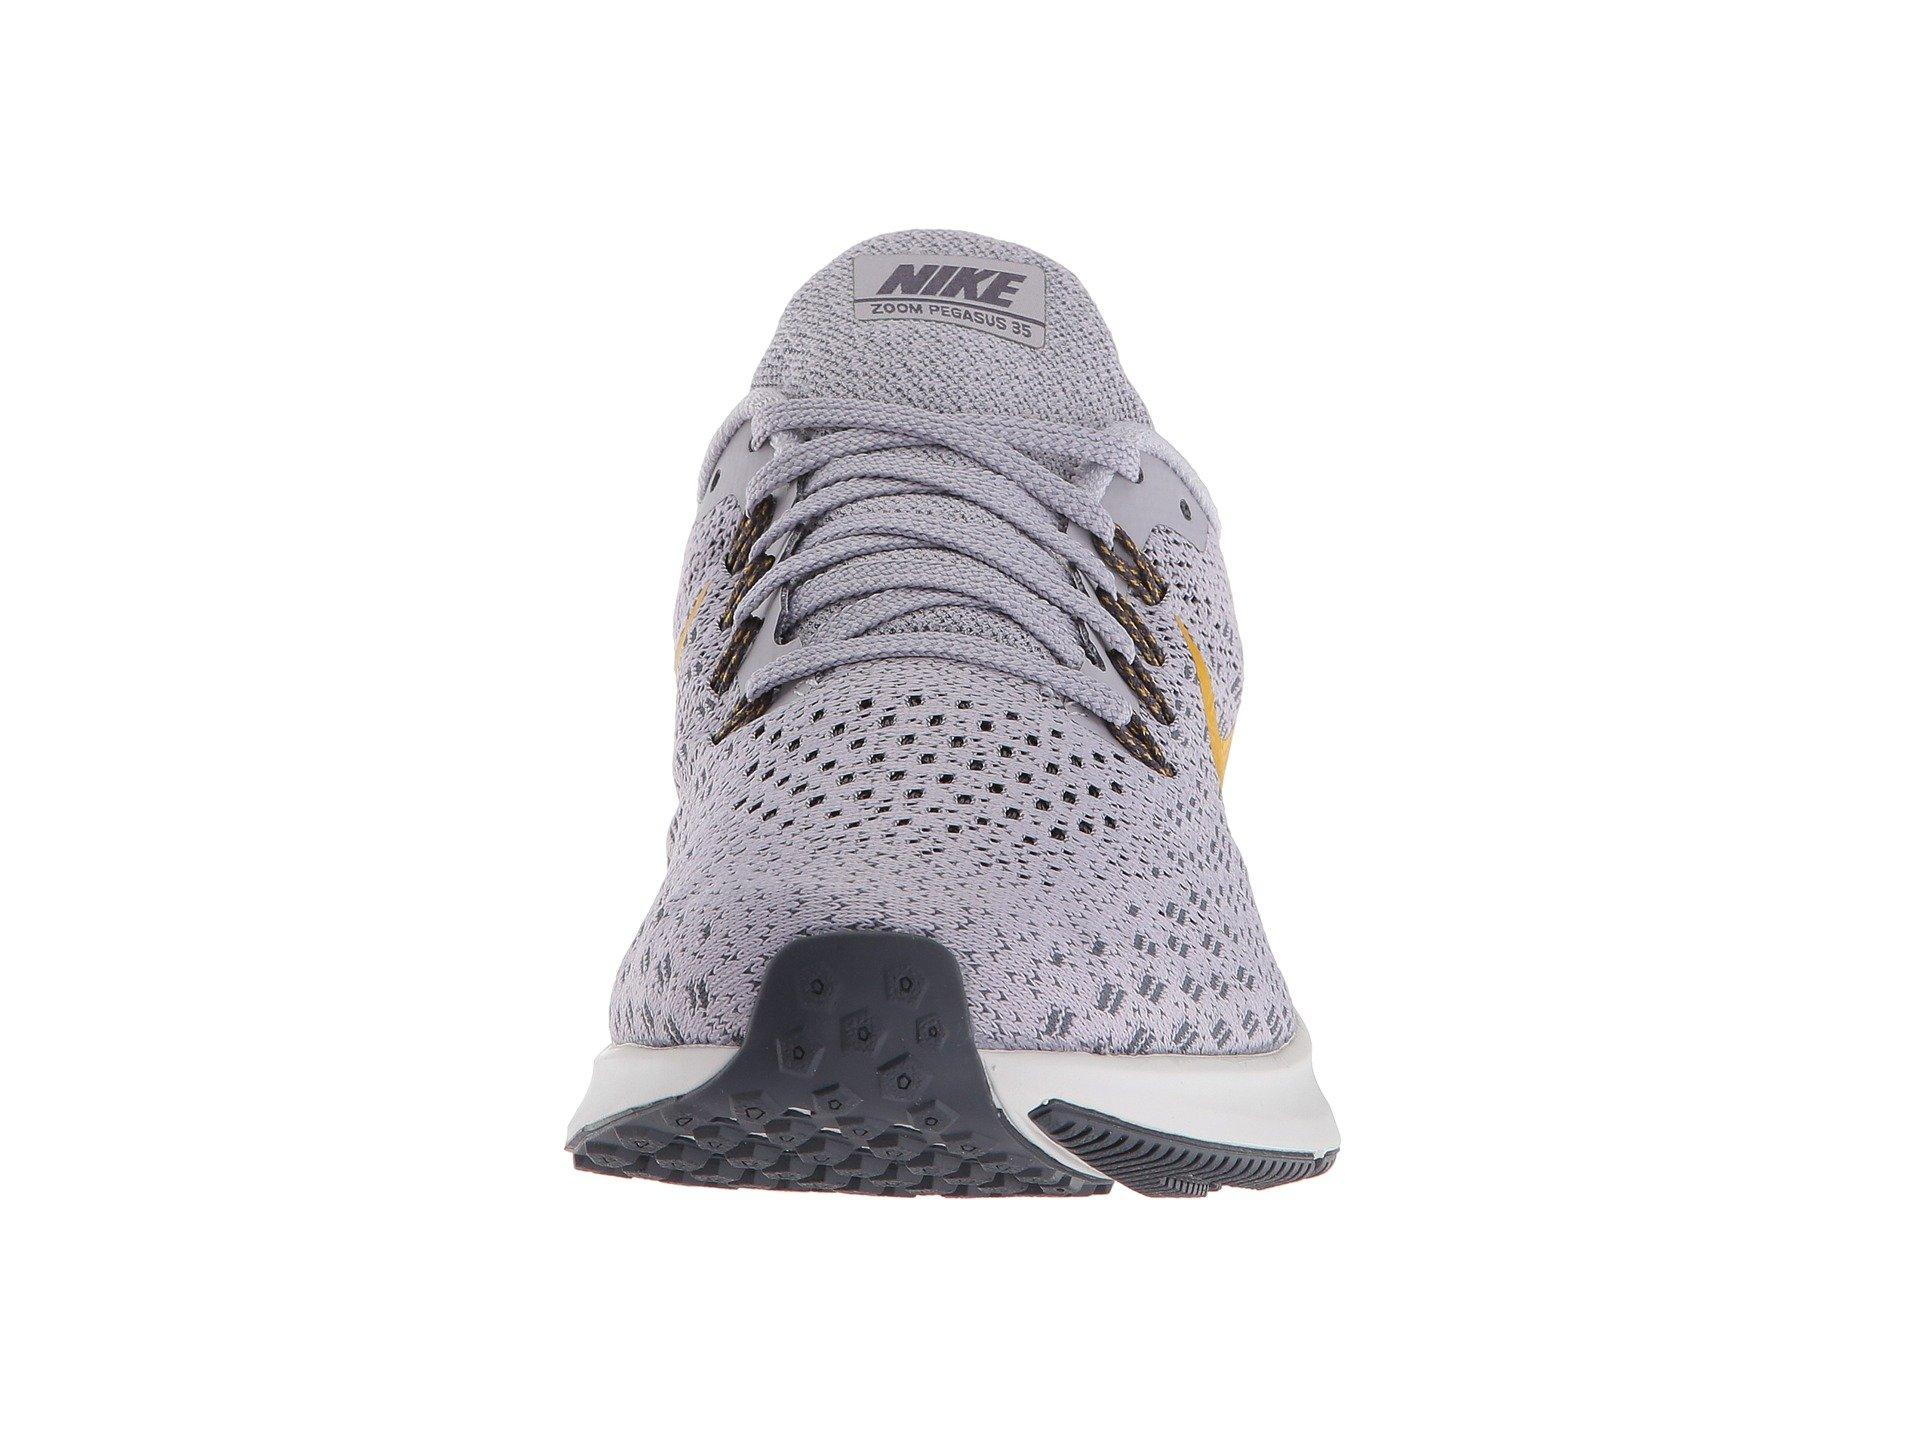 Nike WMNS Air Zoom Pegasus 35 Womens 942855-500 Size 5 by Nike (Image #5)